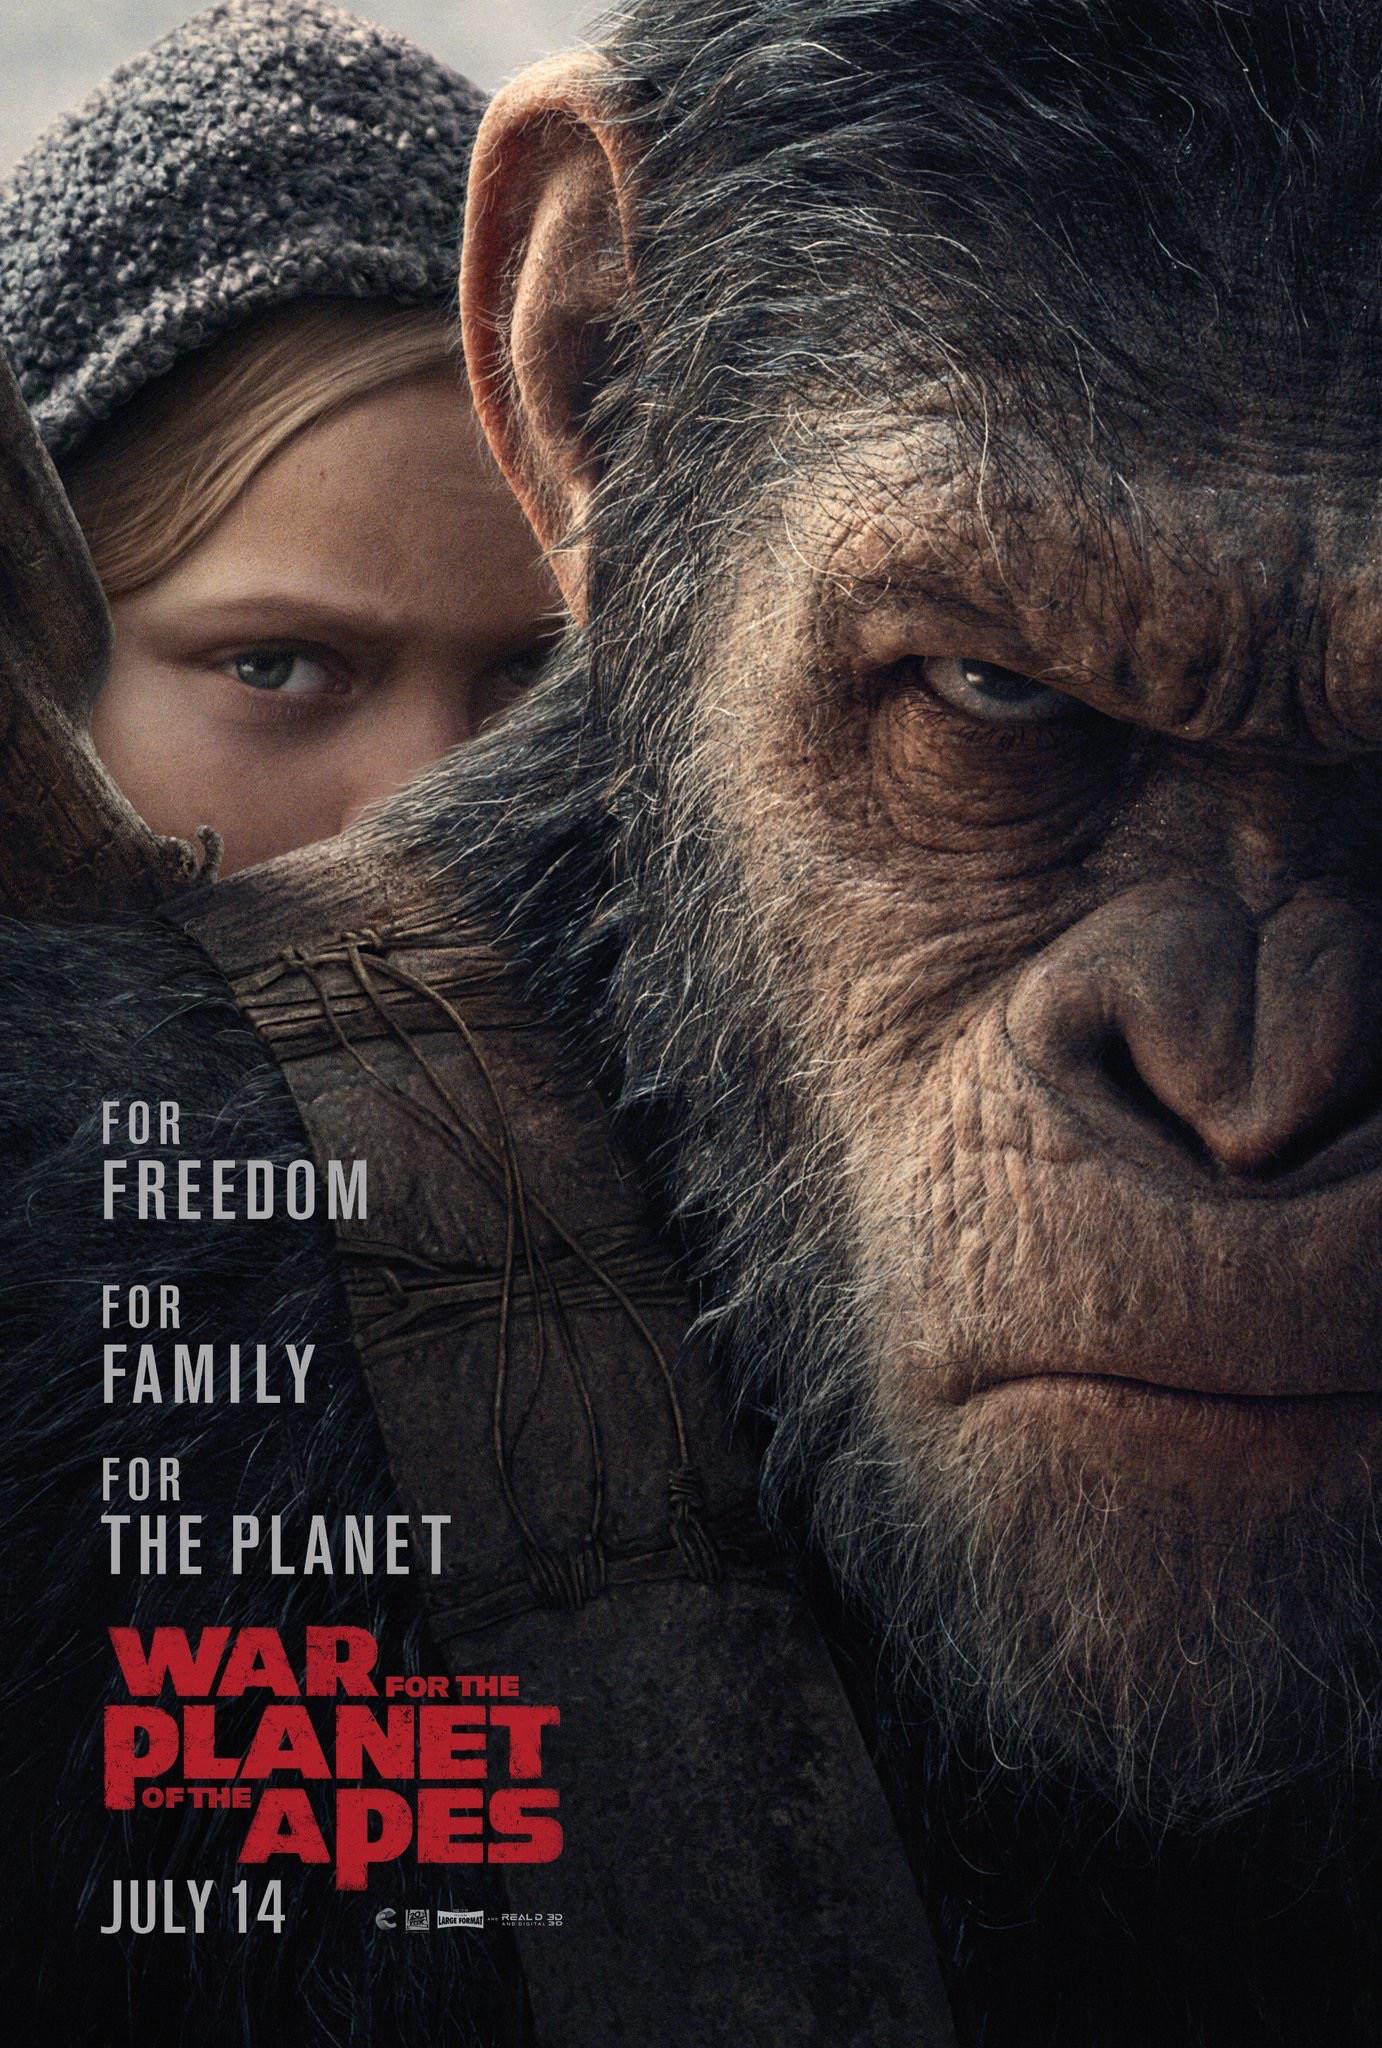 Maymunlar Cehennemi: Savaş filmi orijinal film afişi